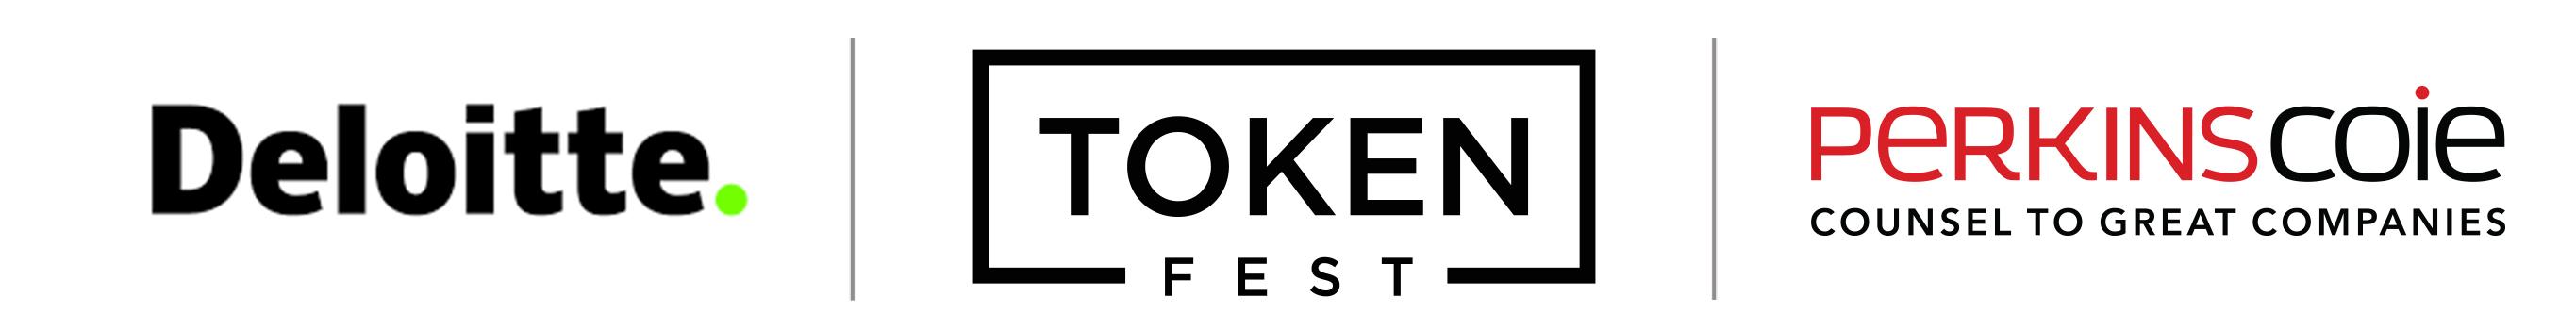 Blockchain Hosts: Deloitte | Token Fest | Perkins Coie